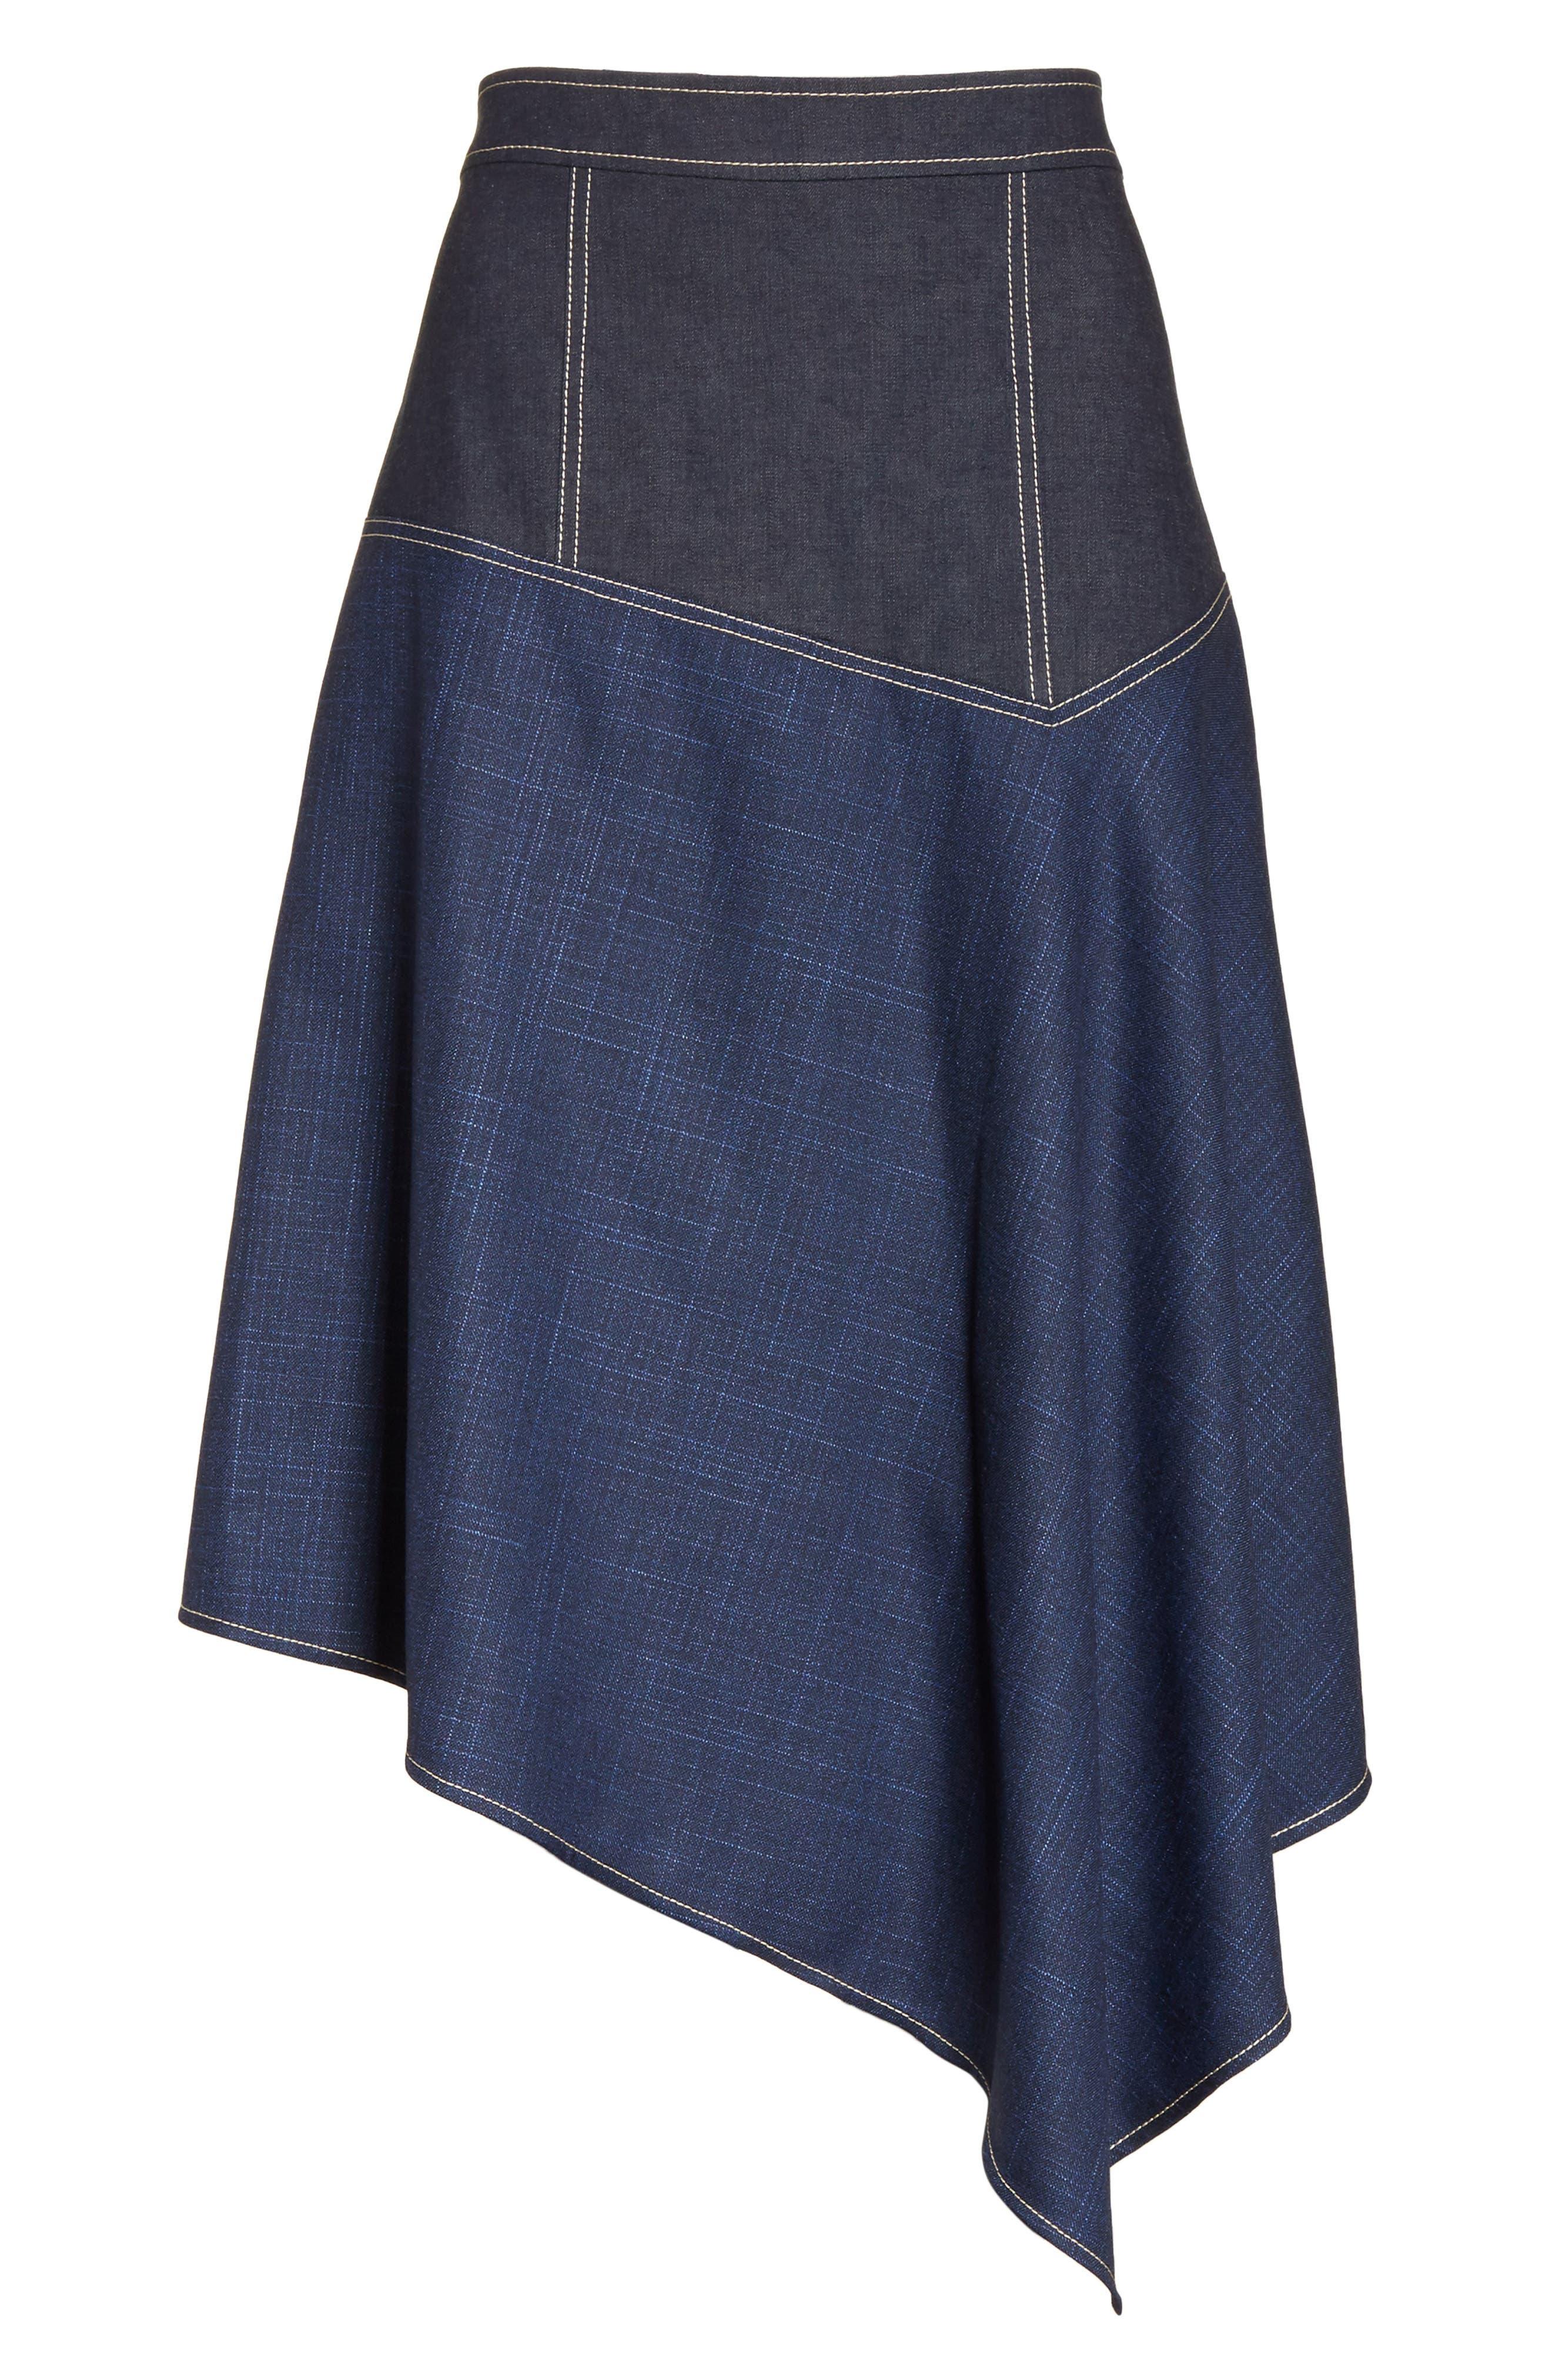 Asymmetrical Mixed Media Skirt,                             Alternate thumbnail 6, color,                             410